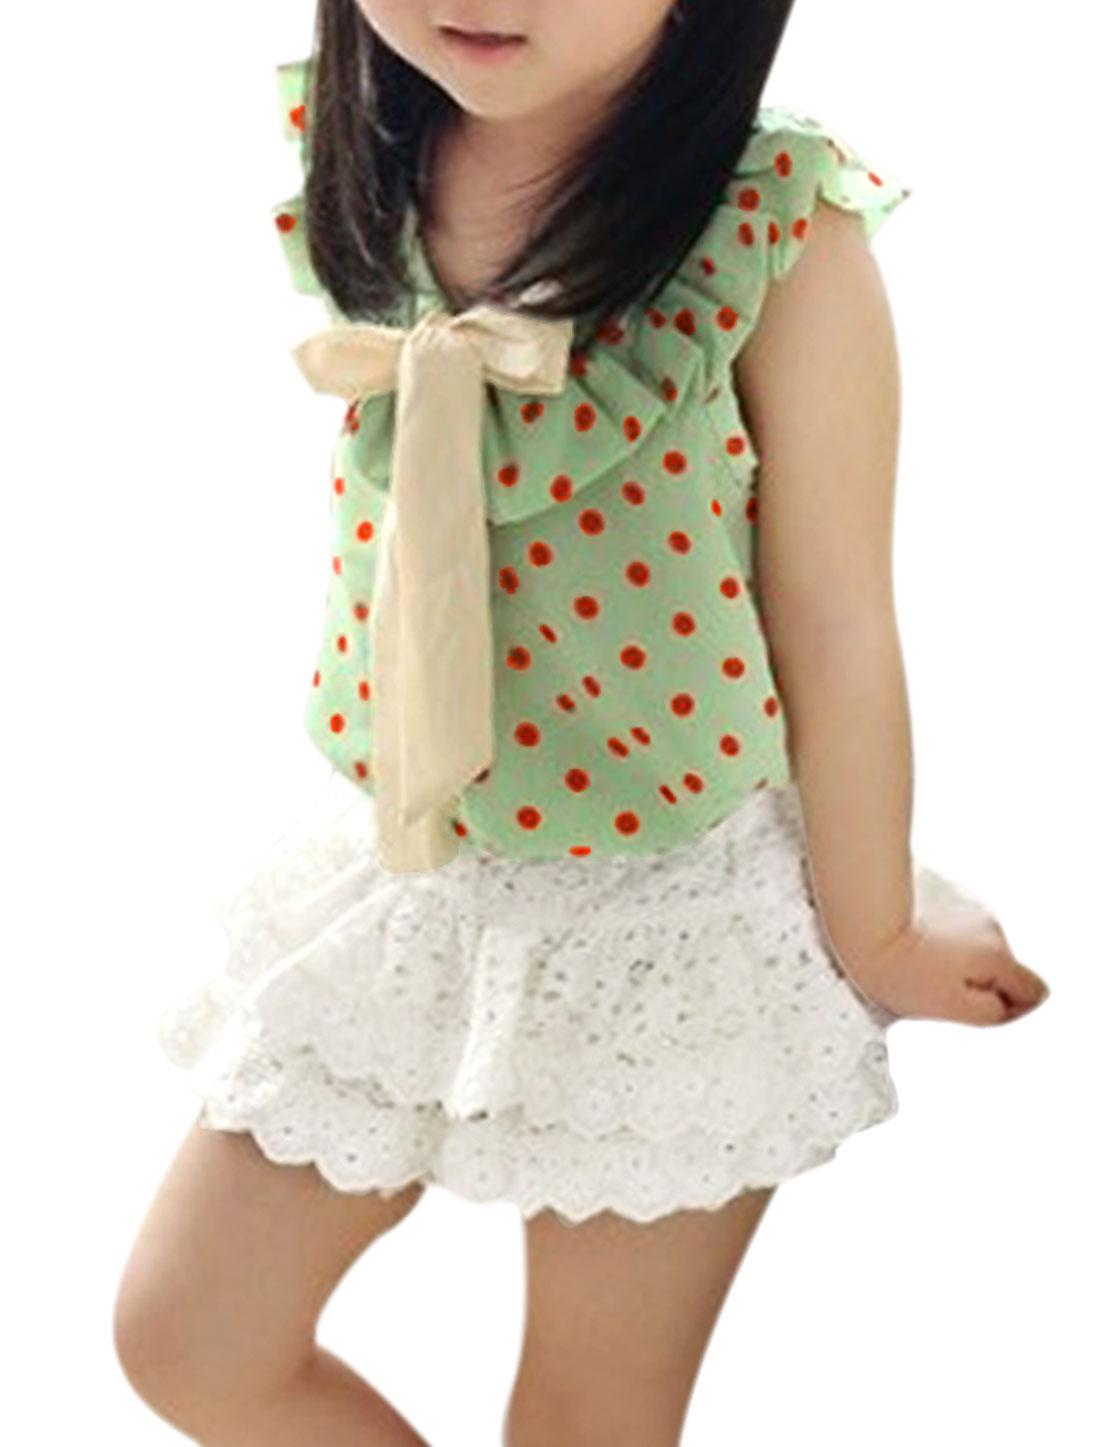 Girls Summer Dots Pattern Sleeveless Top w Floral Design Skort Light Green White US Size 7